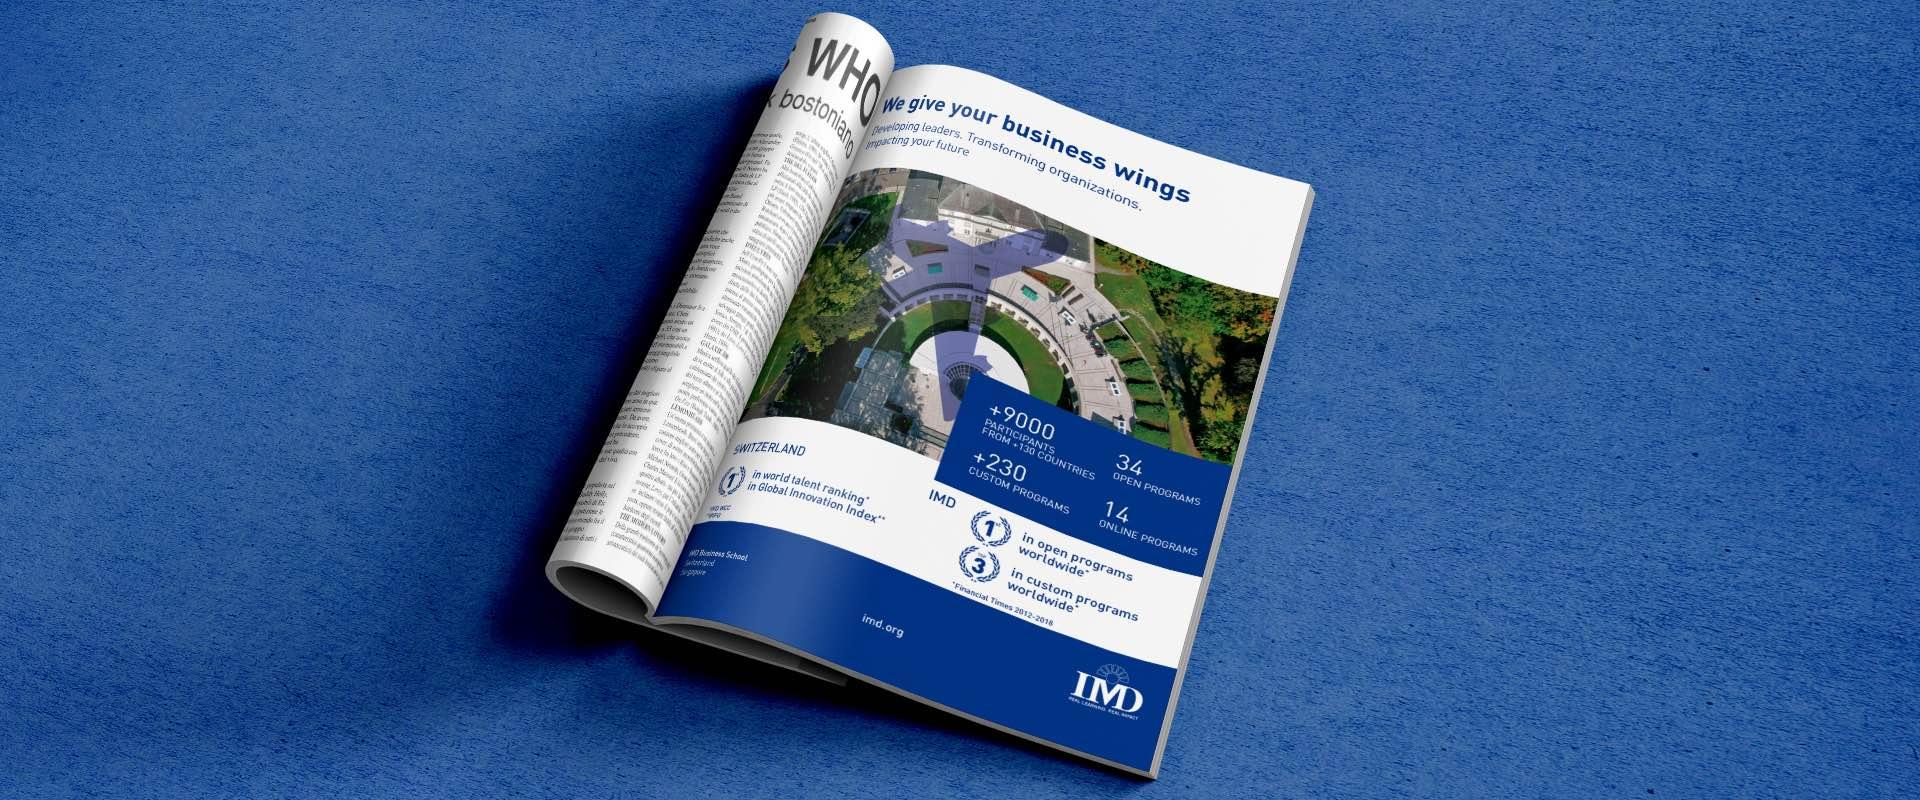 campagna pubblicitaria IMD sul magazine di Brussels Airlines